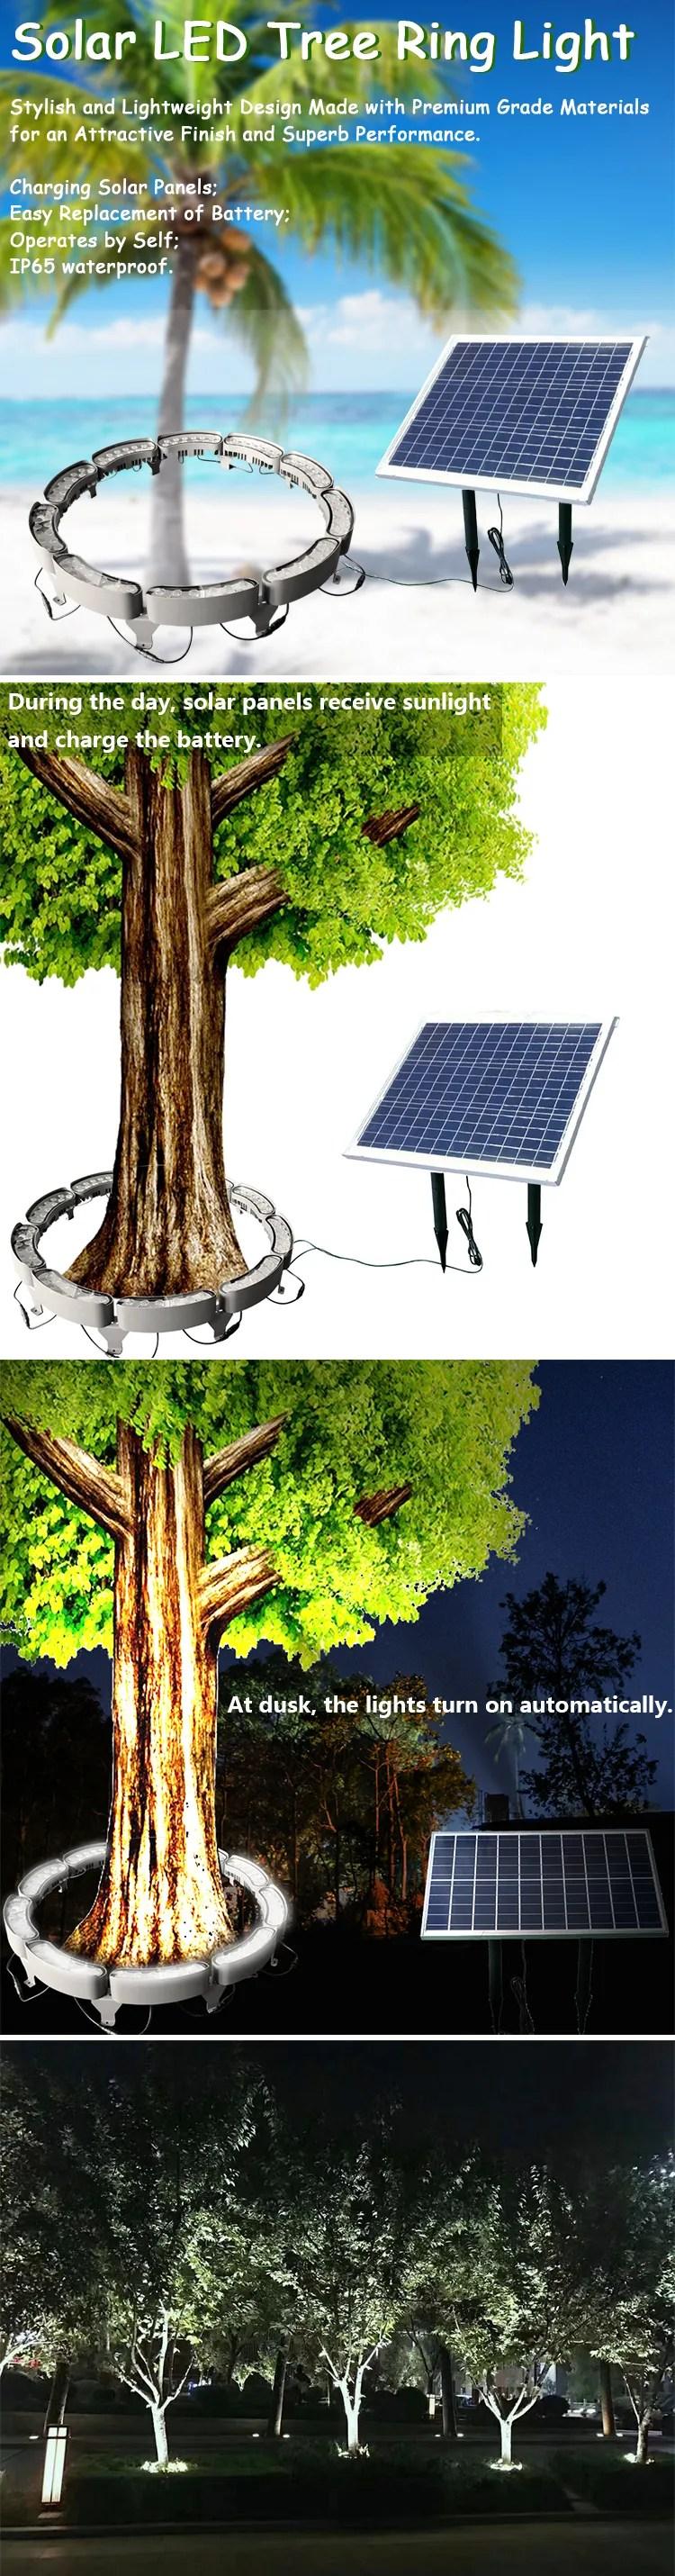 new design high efficiency landscape lamp spotlight for palm tree solar led tree ring light buy solar courtyard lamp outdoor led tree light solar